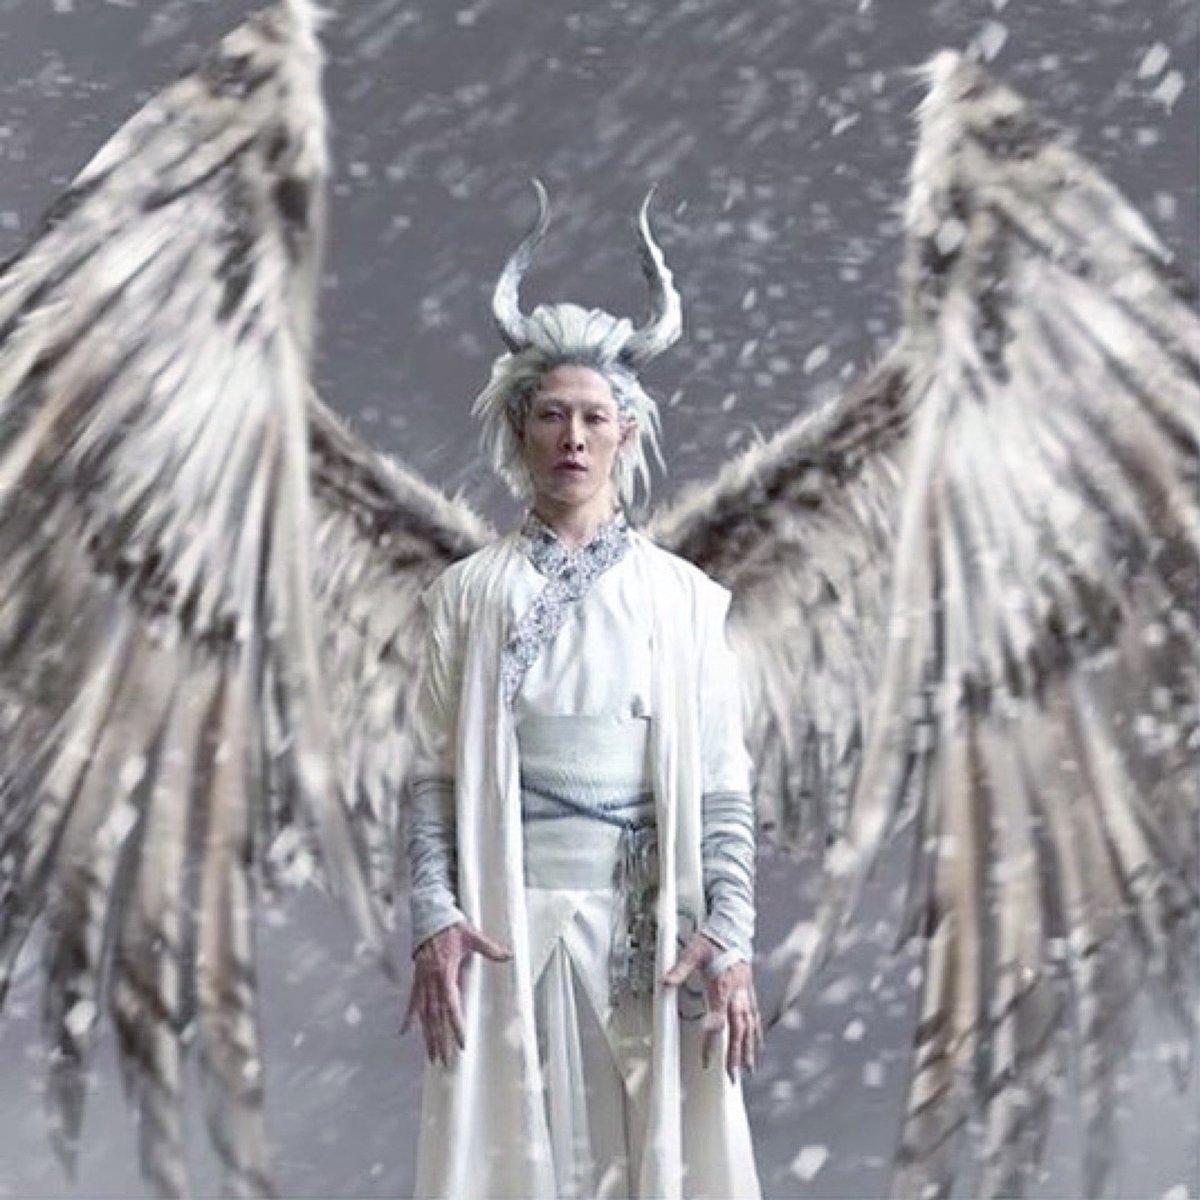 Prototype UDO ver.1.0 #NOTEdwardScissorHands #初期型ウド #シザーハンズじゃないよ #Repost @miyavi_fanpage 【 𝐈𝐥𝐥𝐮𝐬𝐭𝐫𝐚𝐭𝐢𝐨𝐧 】 #repost @ byellenm 🙌🏻 #darkeyfey #wingedwarriors #tundra #desert #maleficentmistressofevil #Udo #maleficent2 #MIYAVI